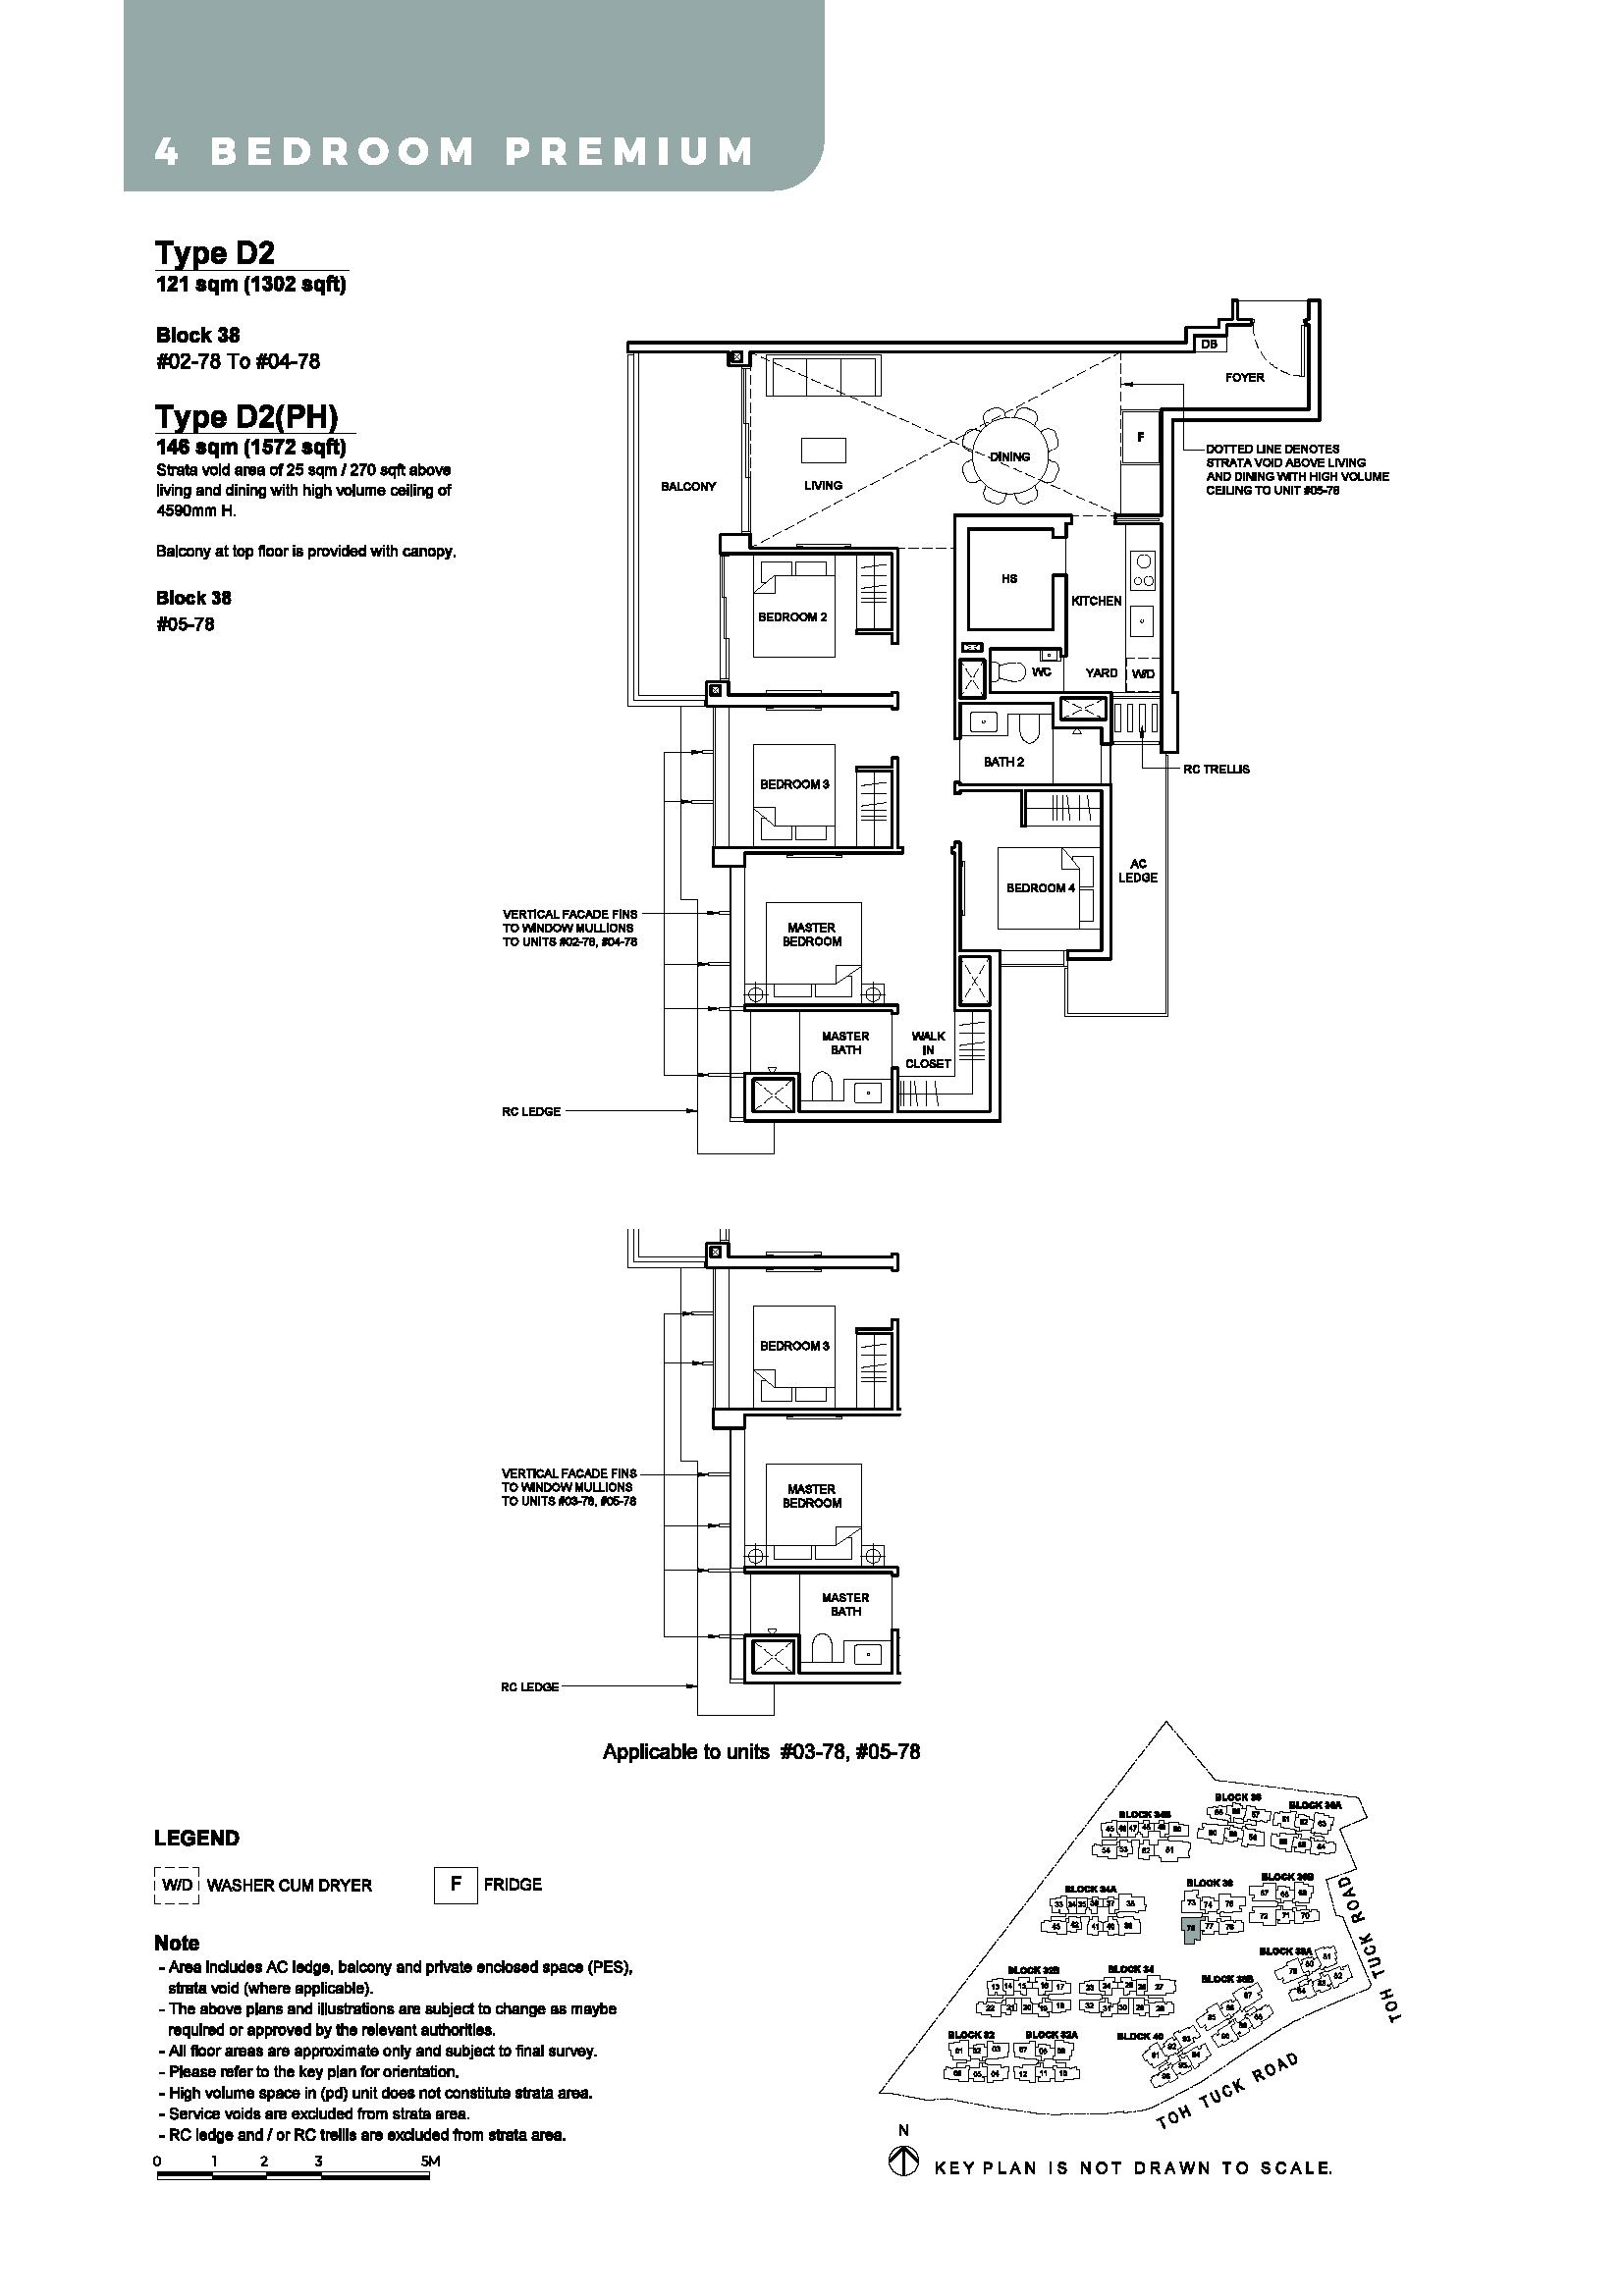 Type D2 - D2(PH)